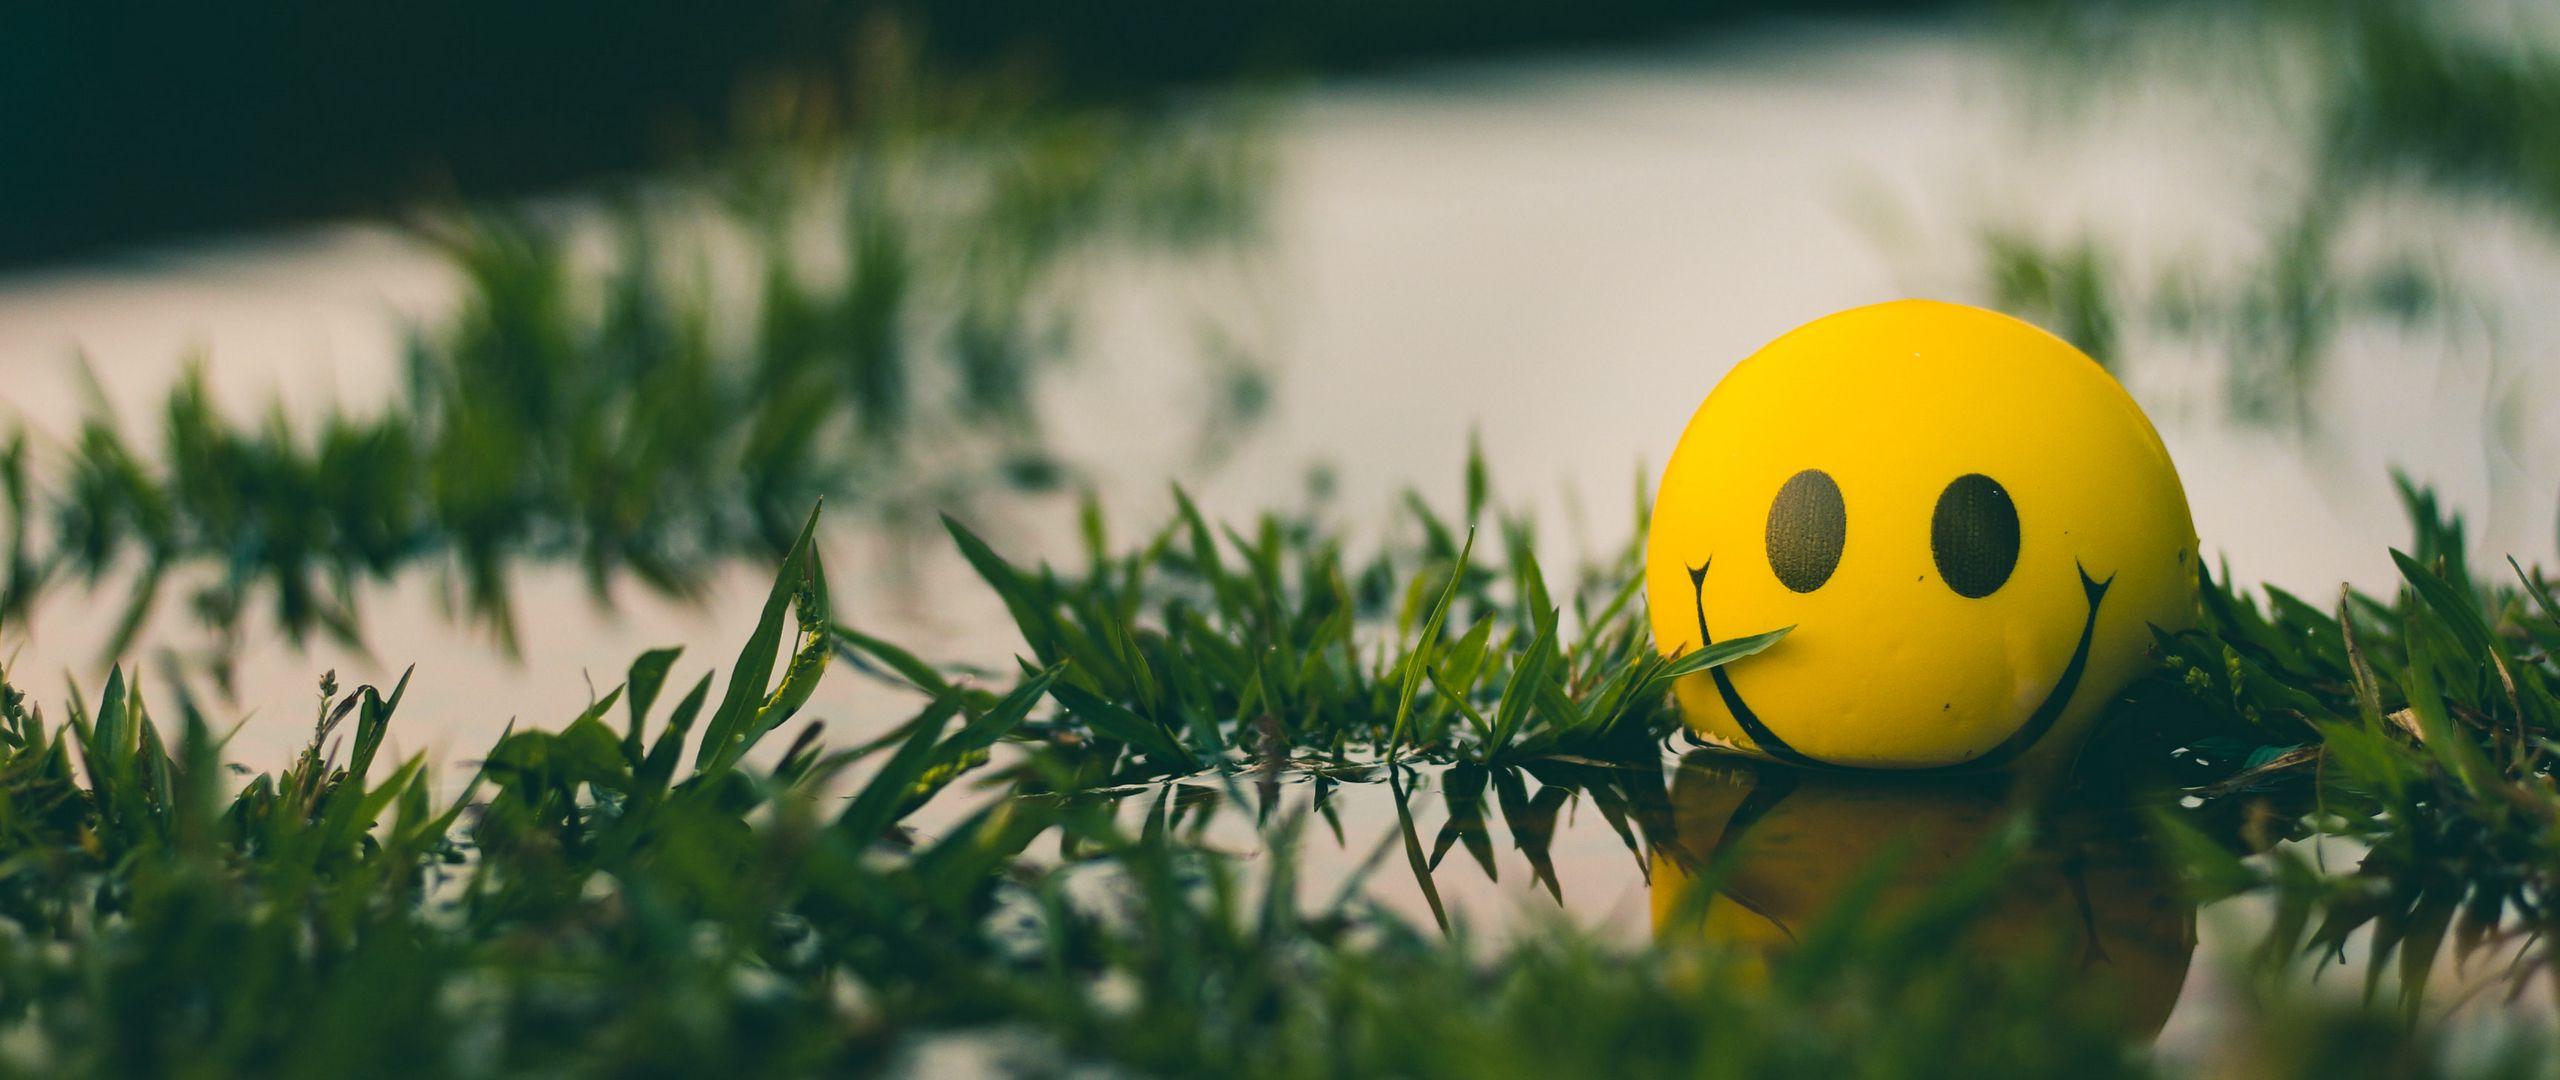 2560x1080 Wallpaper ball, smile, smiley, grass, water